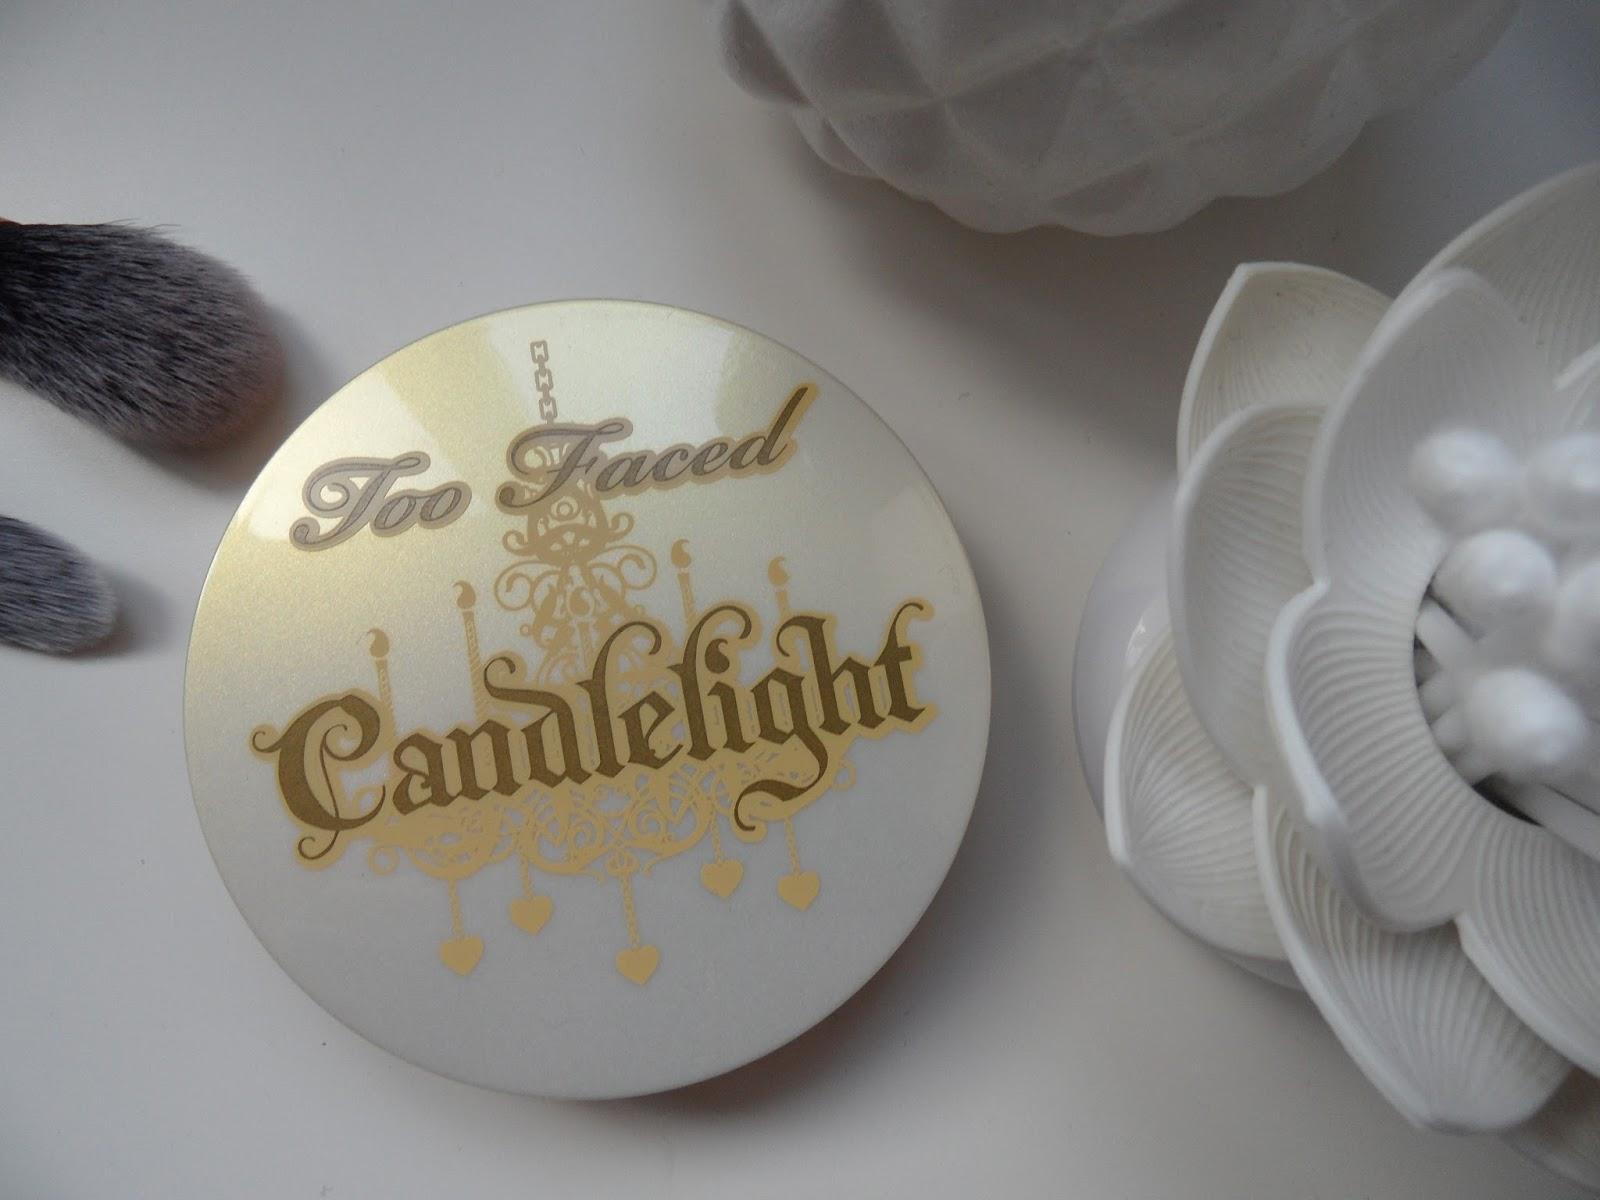 Too Faced Candlelight Highlighter Eyelinerflicks